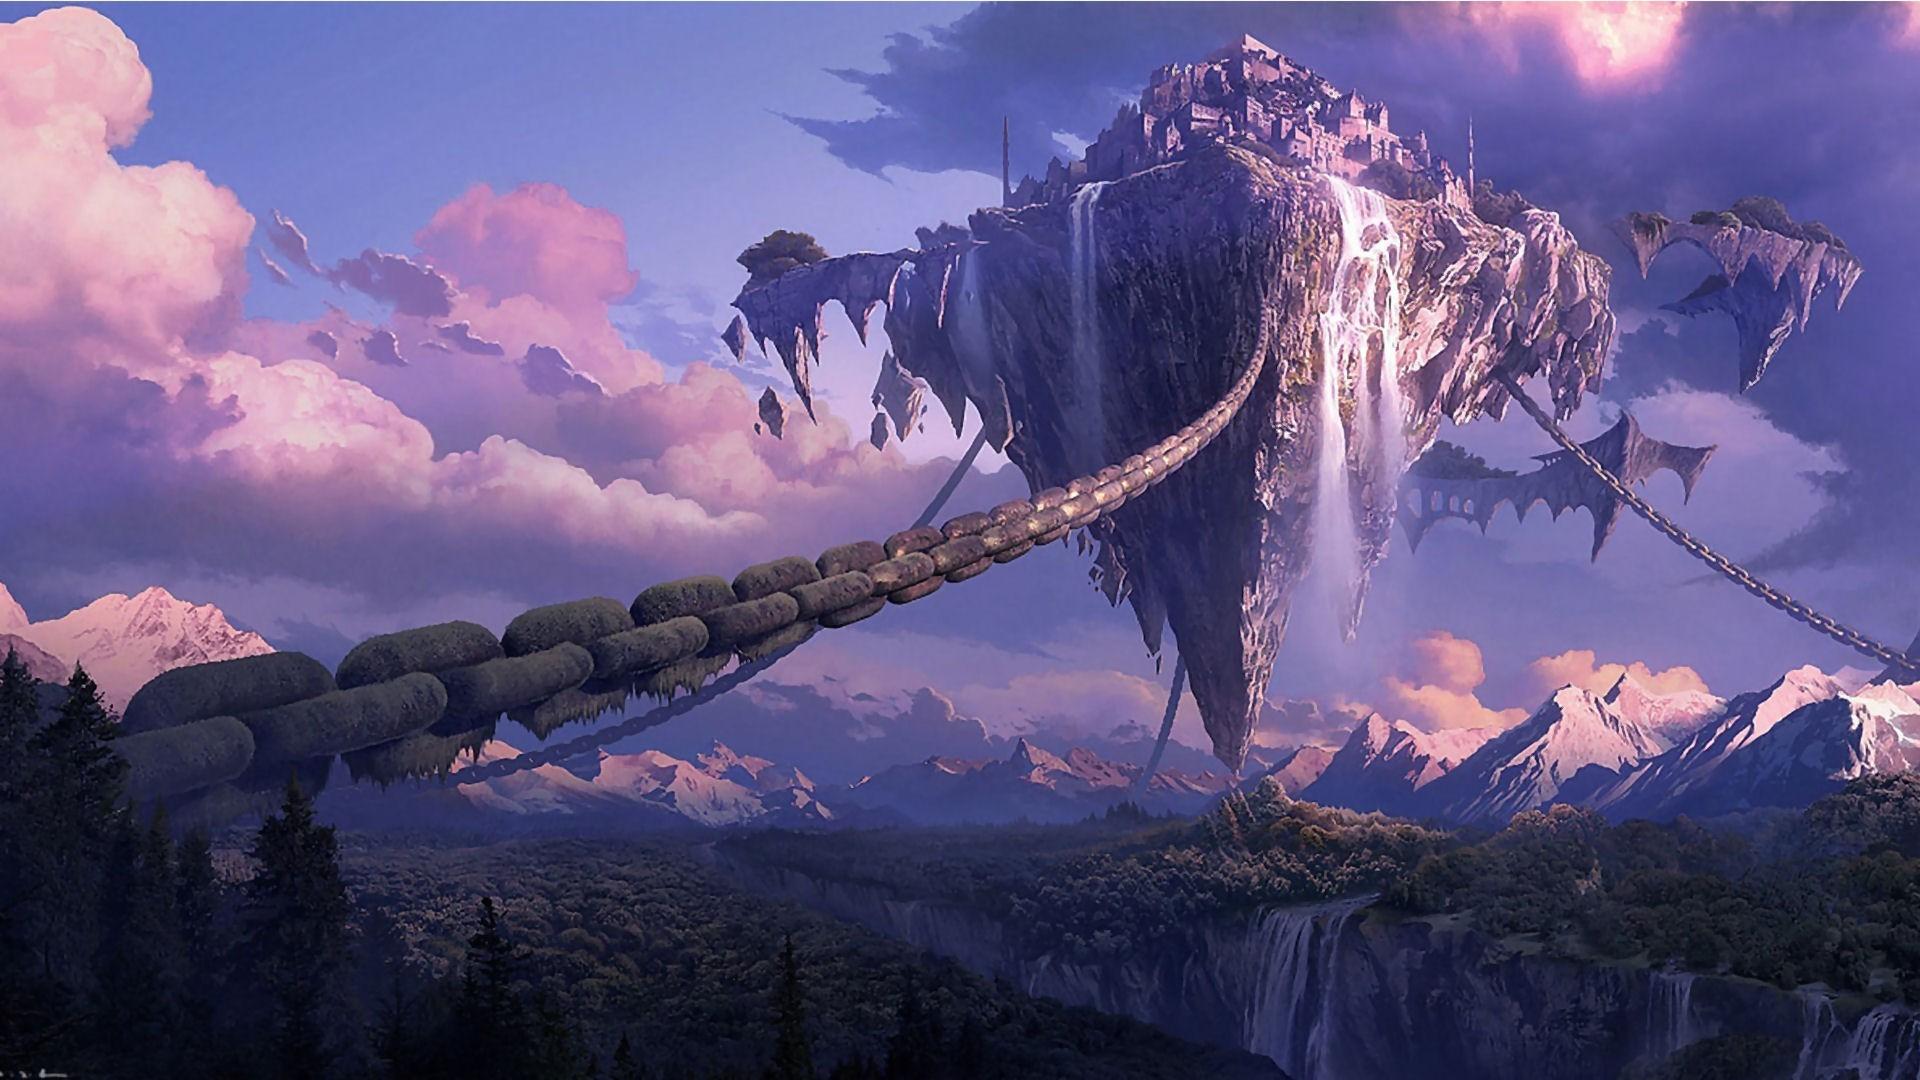 General chains landscape Tera online digital art anime waterfall  fantasy art forest mountain floating island